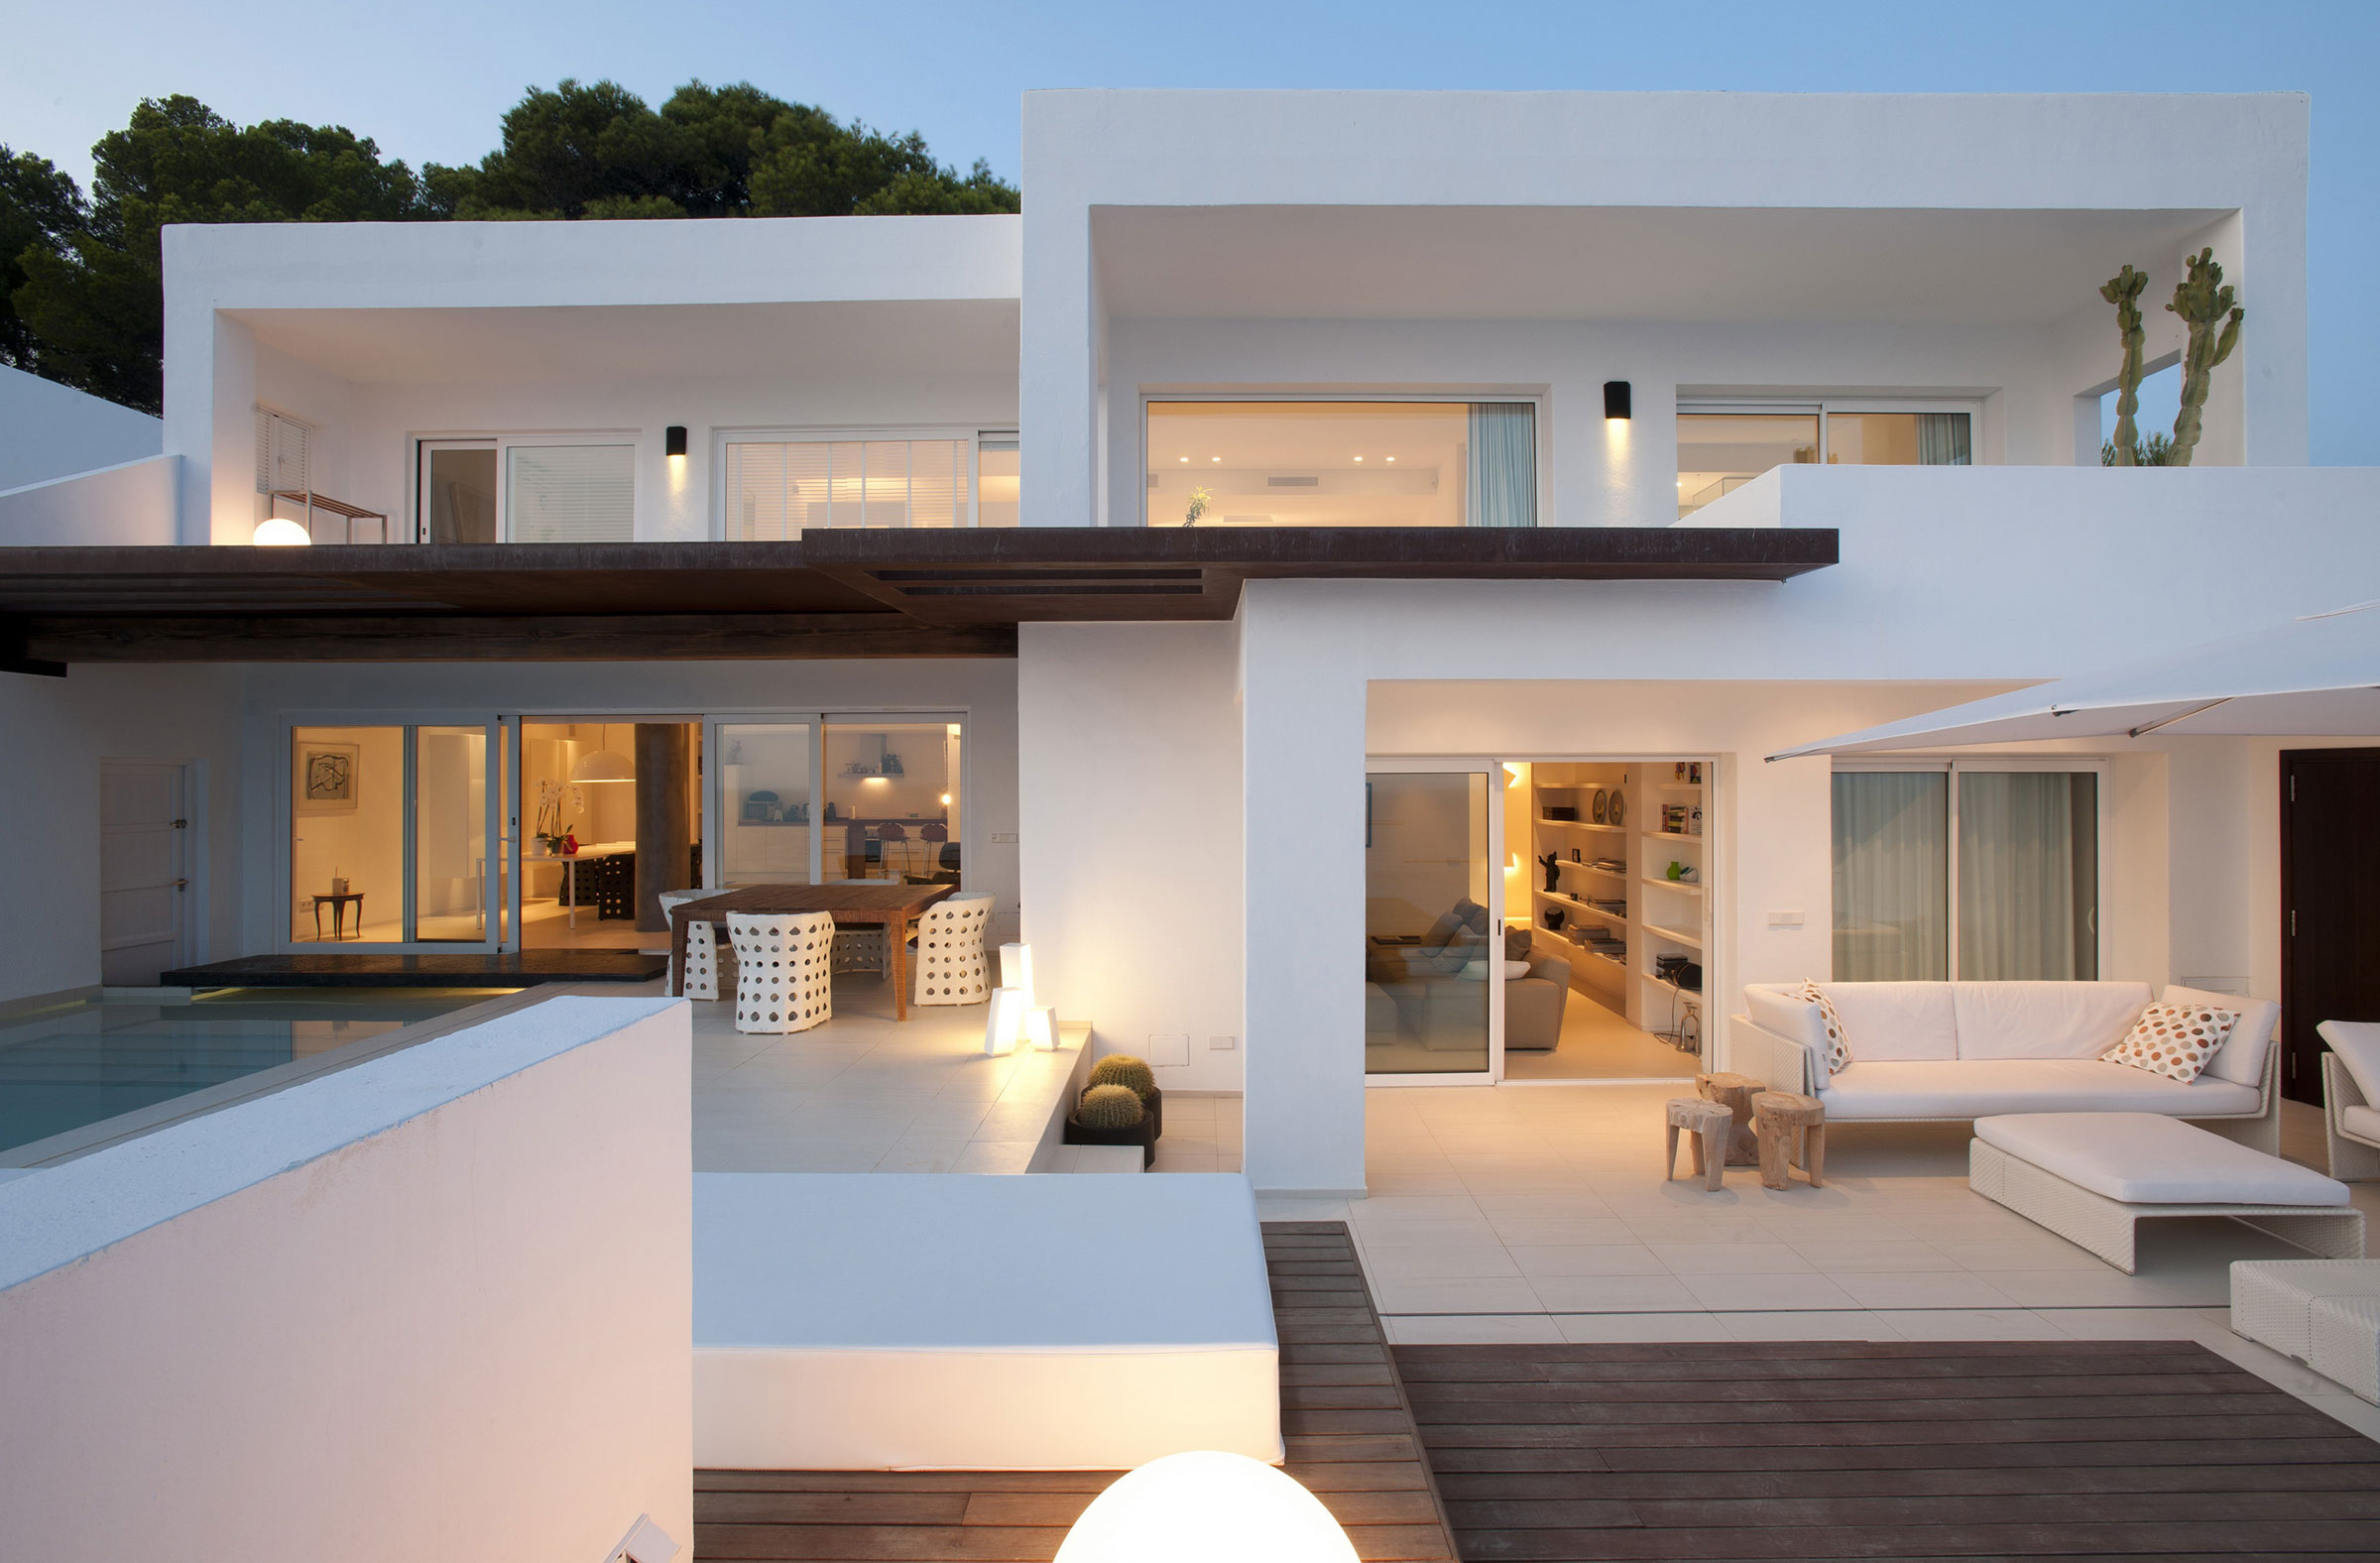 Dupli Dos 01 Dupli Dos by Juma Architects